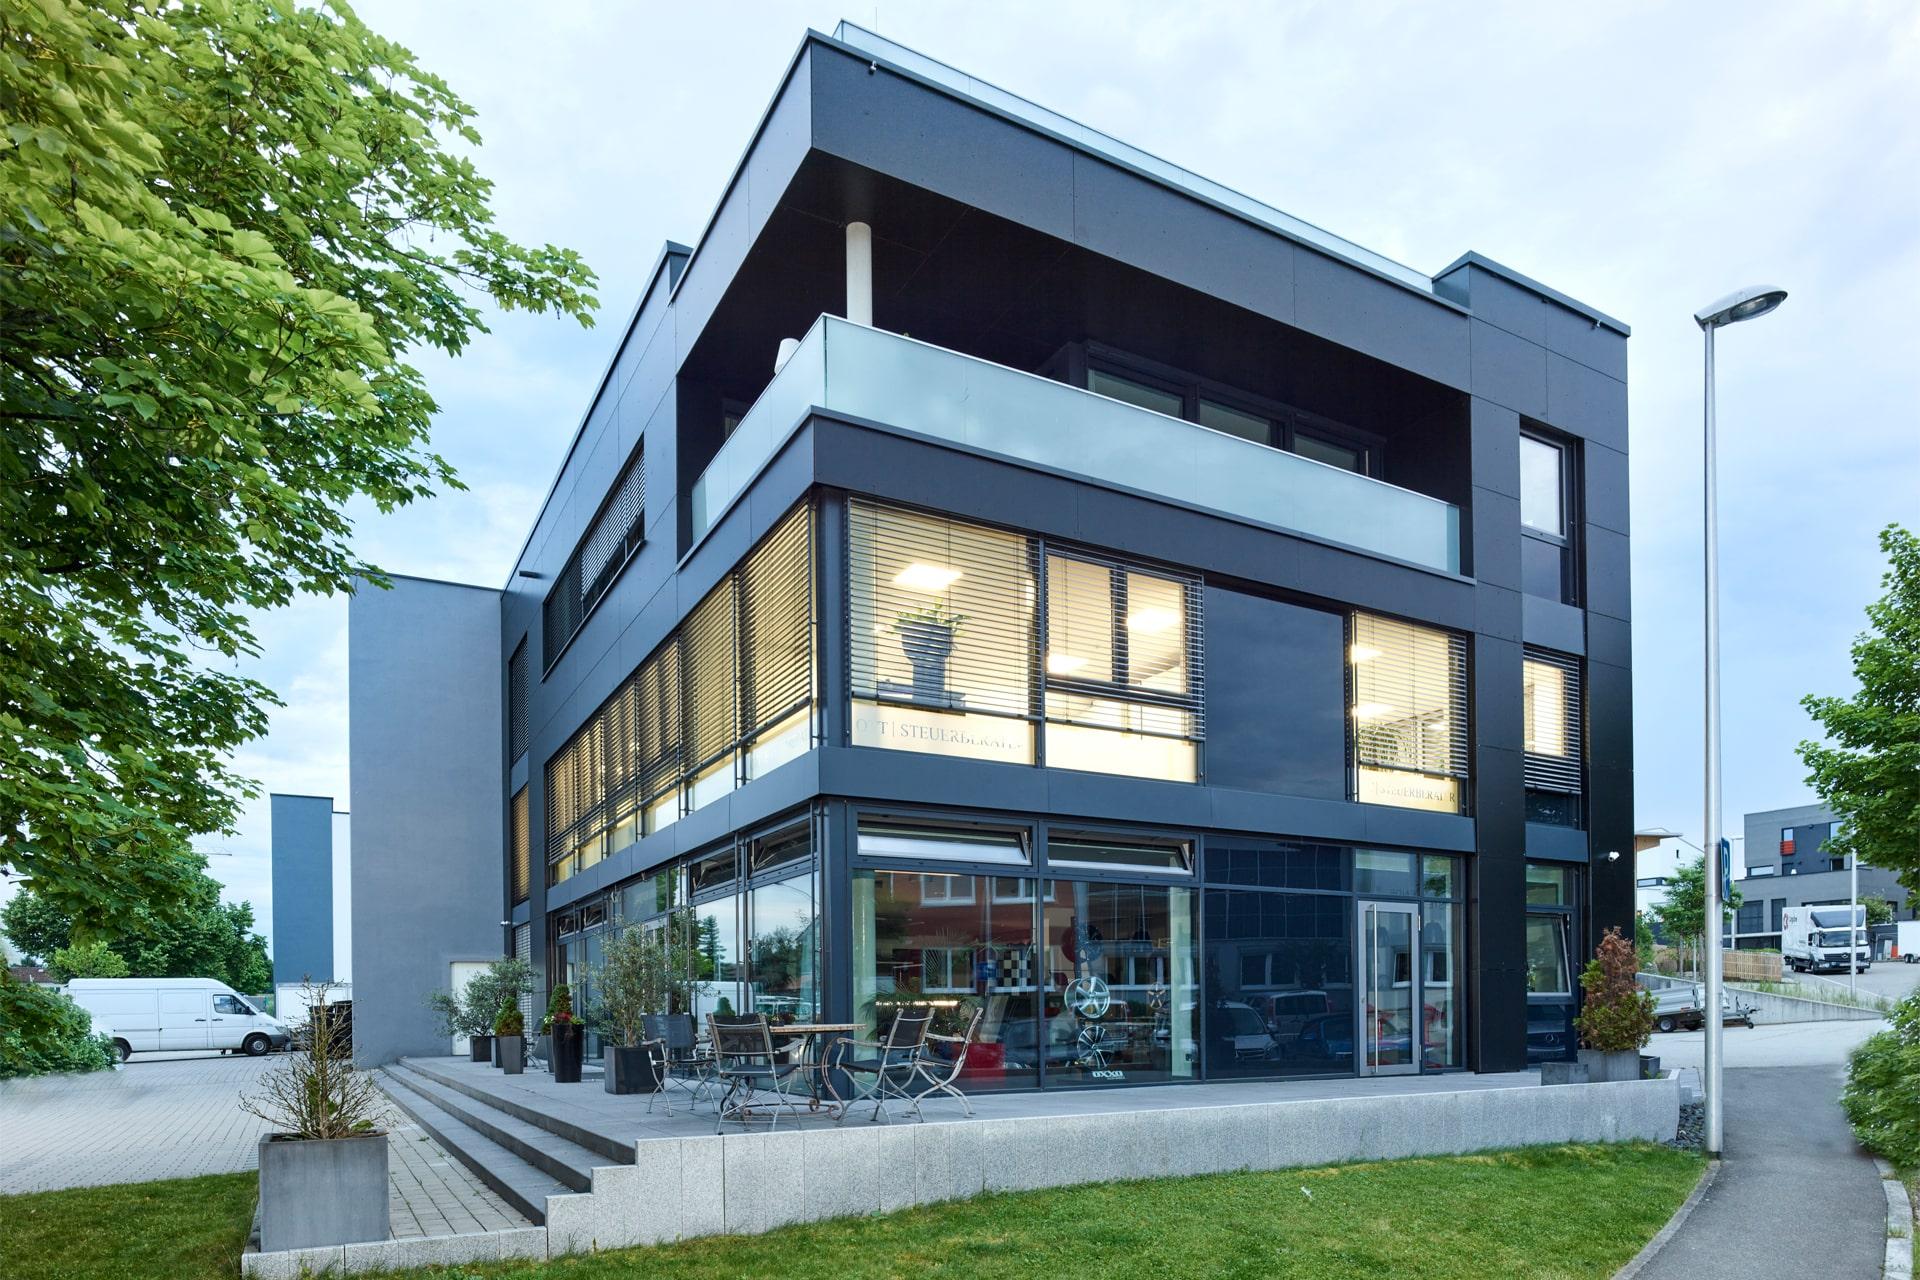 Gebäude | Ott Steuerberater in Korb im Rems-Murr-Kreis